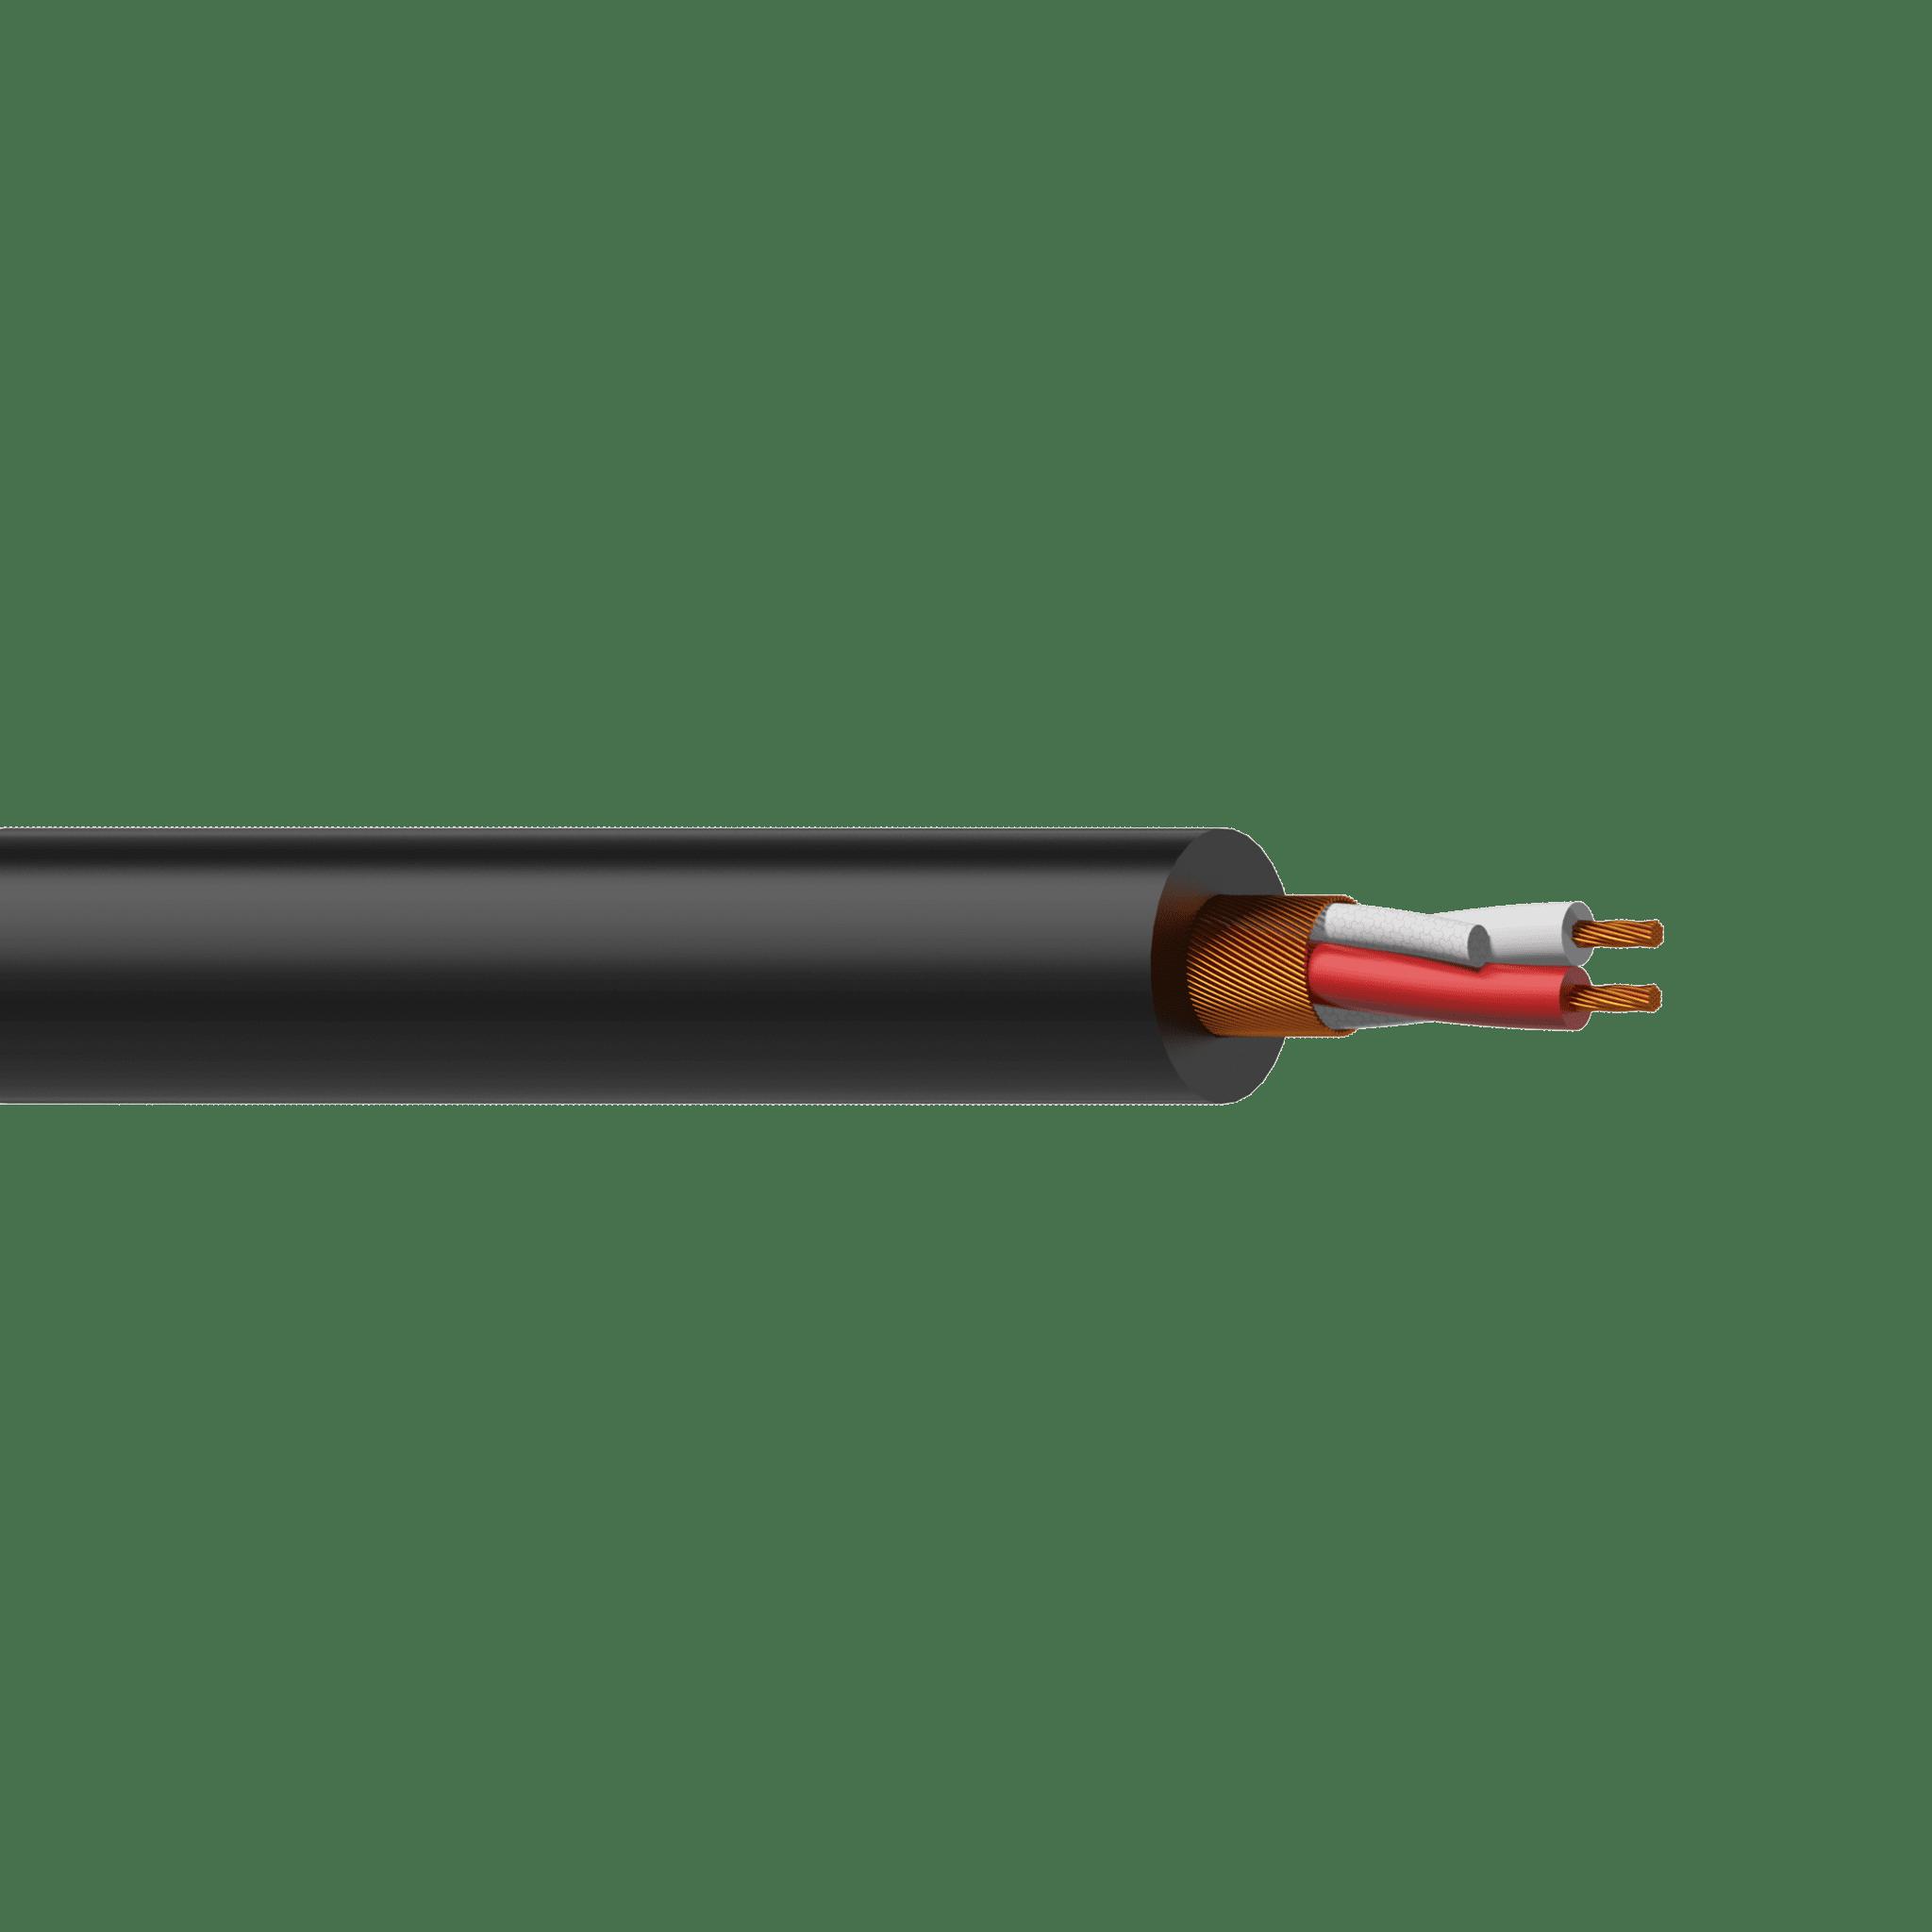 PROMO6A-MC305 - Sample pack MC305